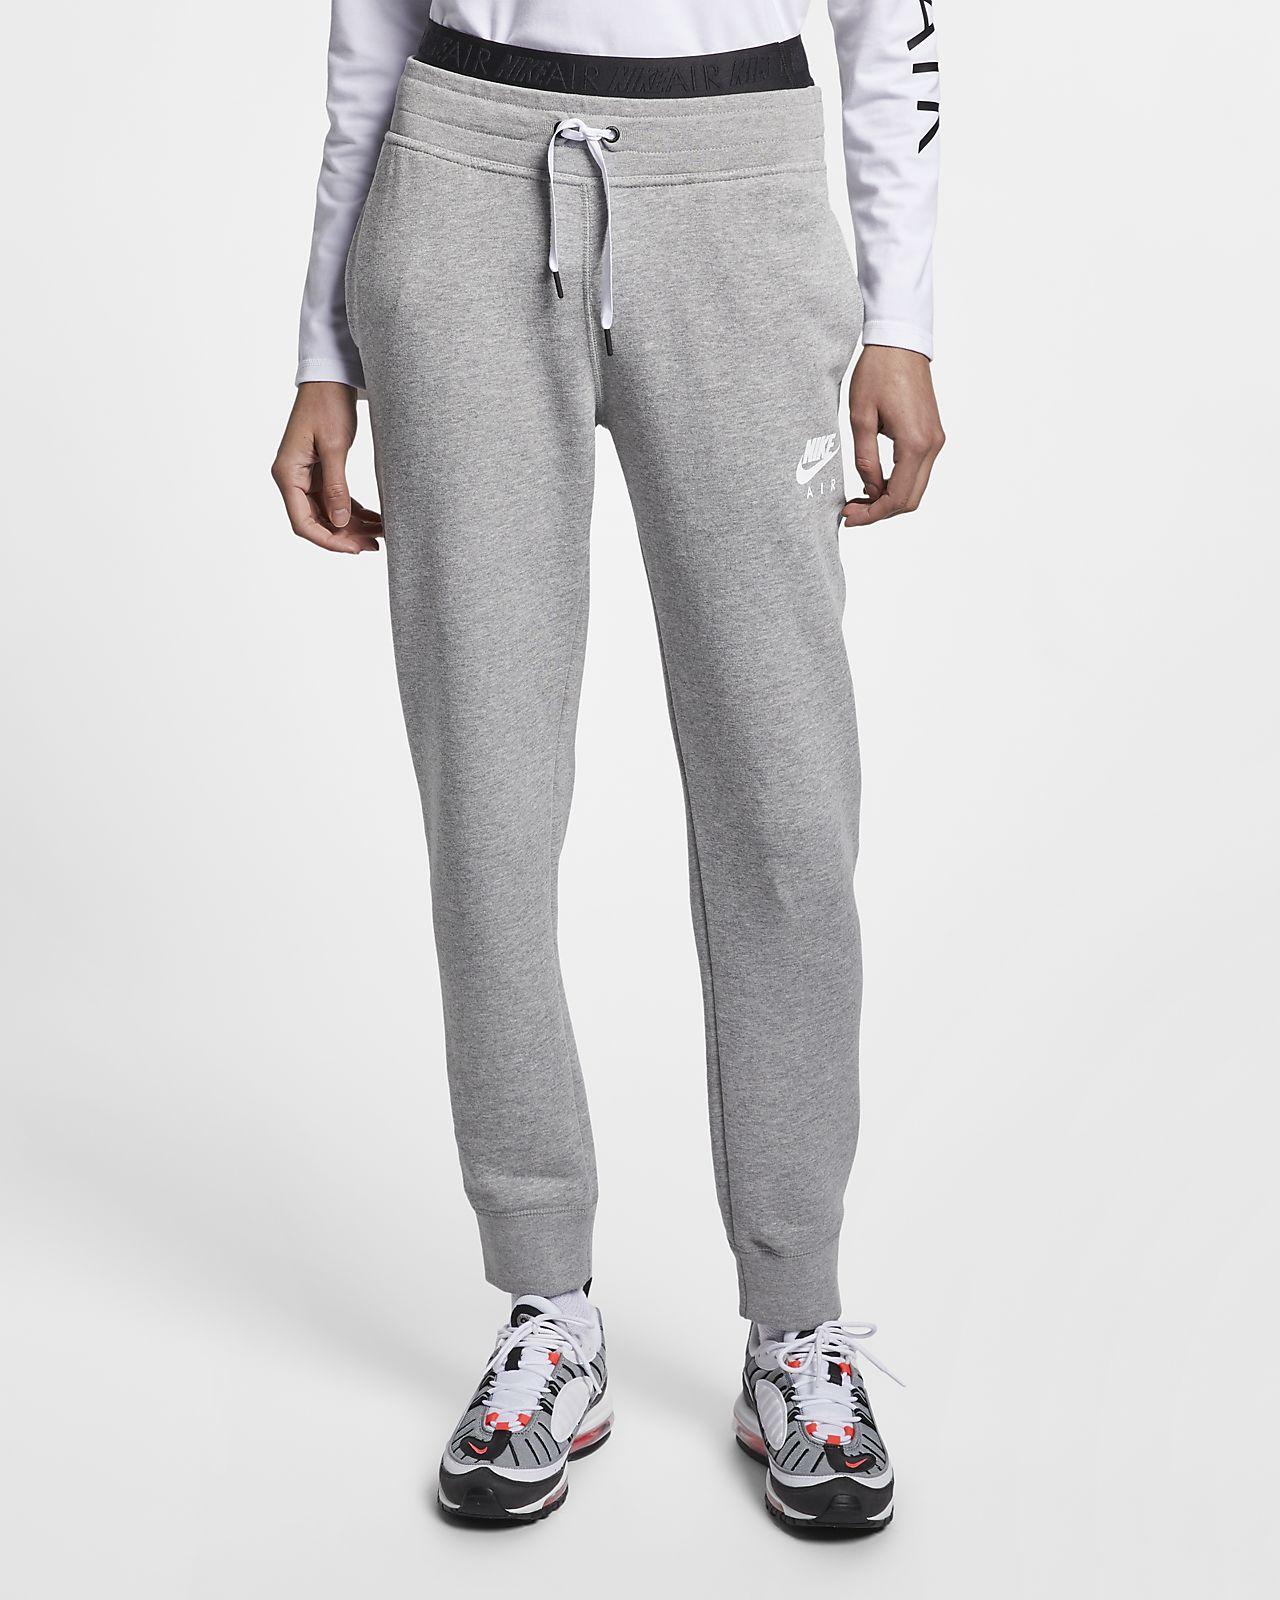 2ef26fddb7ccb Nike Air Pantalón de tejido Fleece - Mujer. Nike.com ES